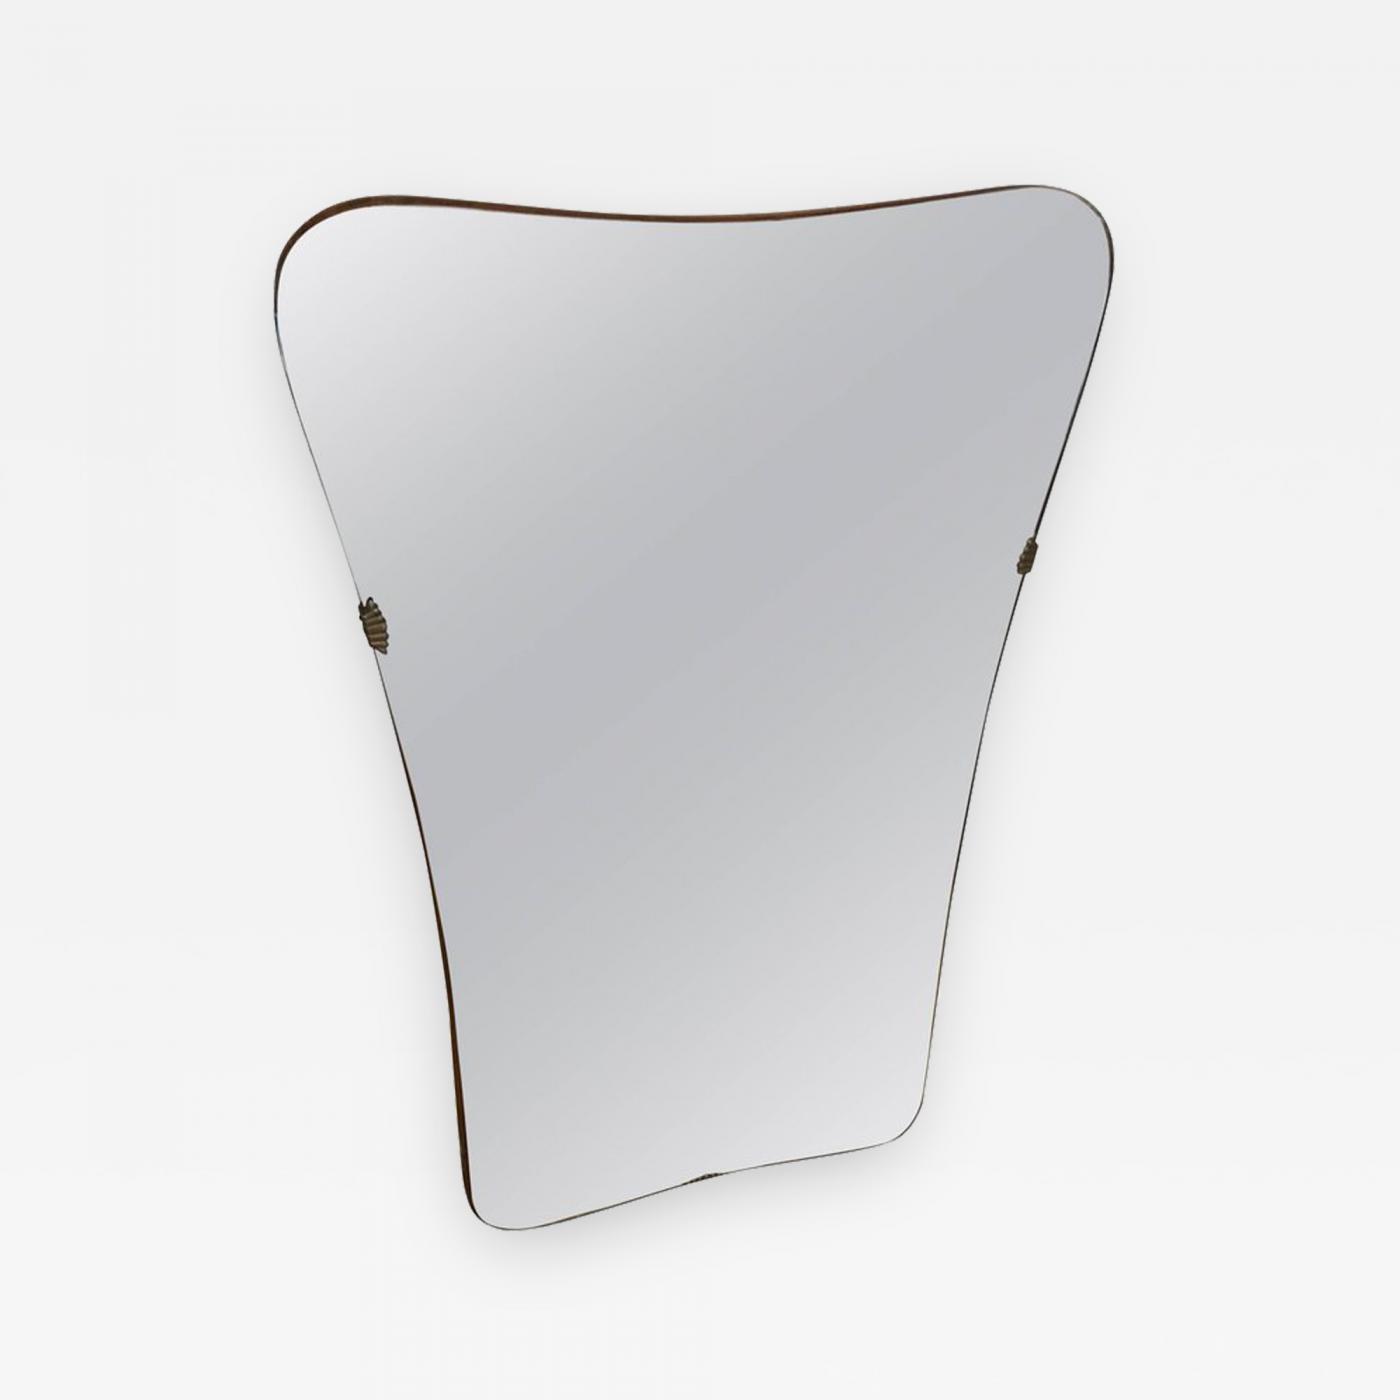 Gio Ponti Italian Mid Century Modern Wall Mirror In The Style Of Gio Ponti